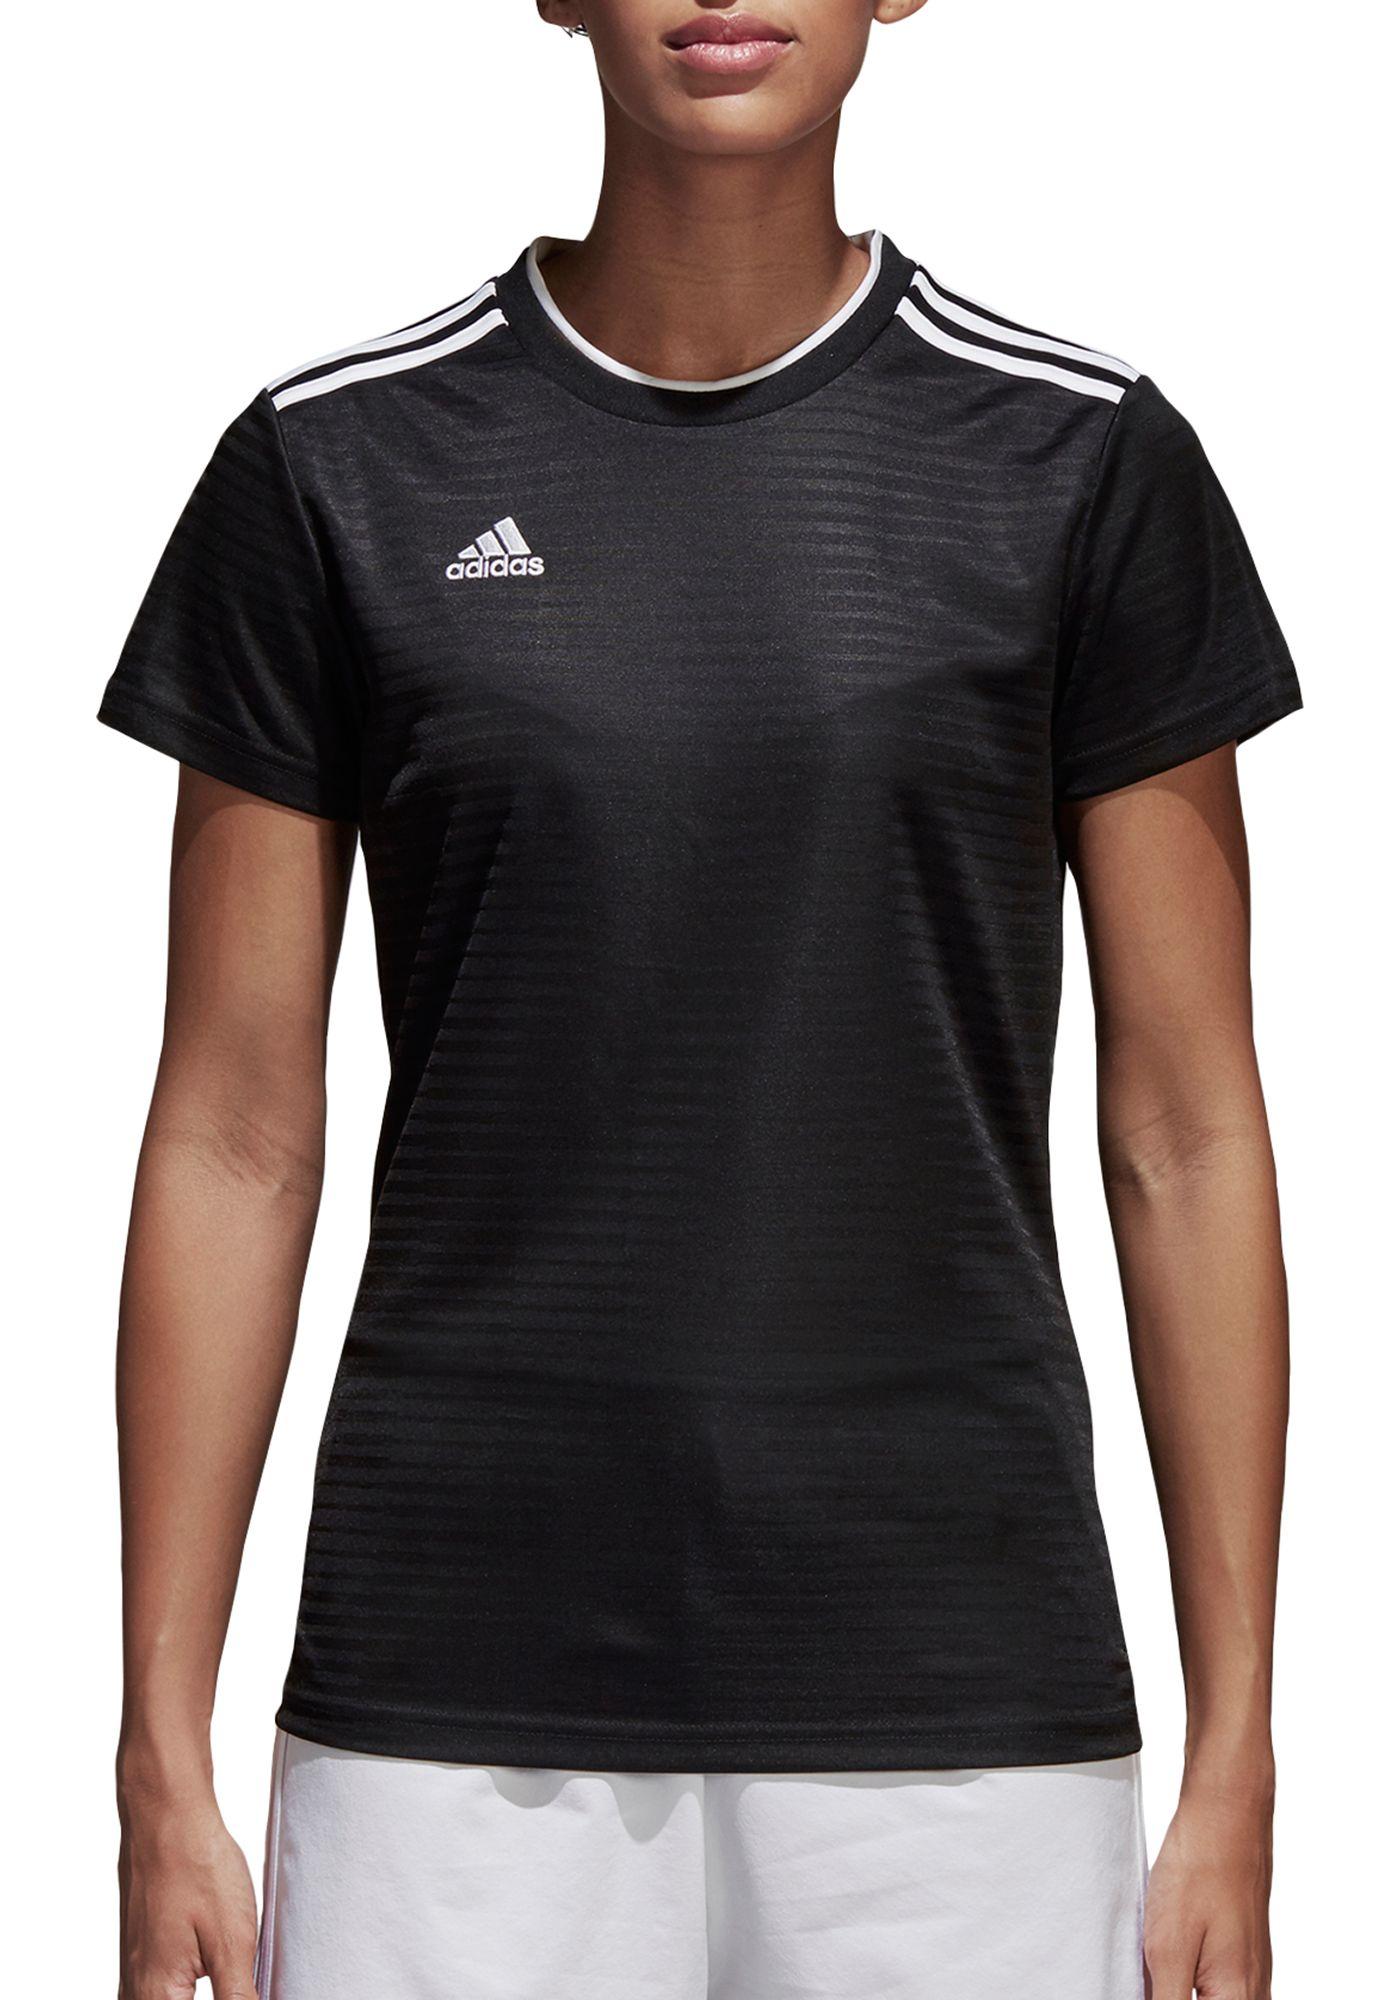 adidas Women's Condivo 18 Jersey T-Shirt